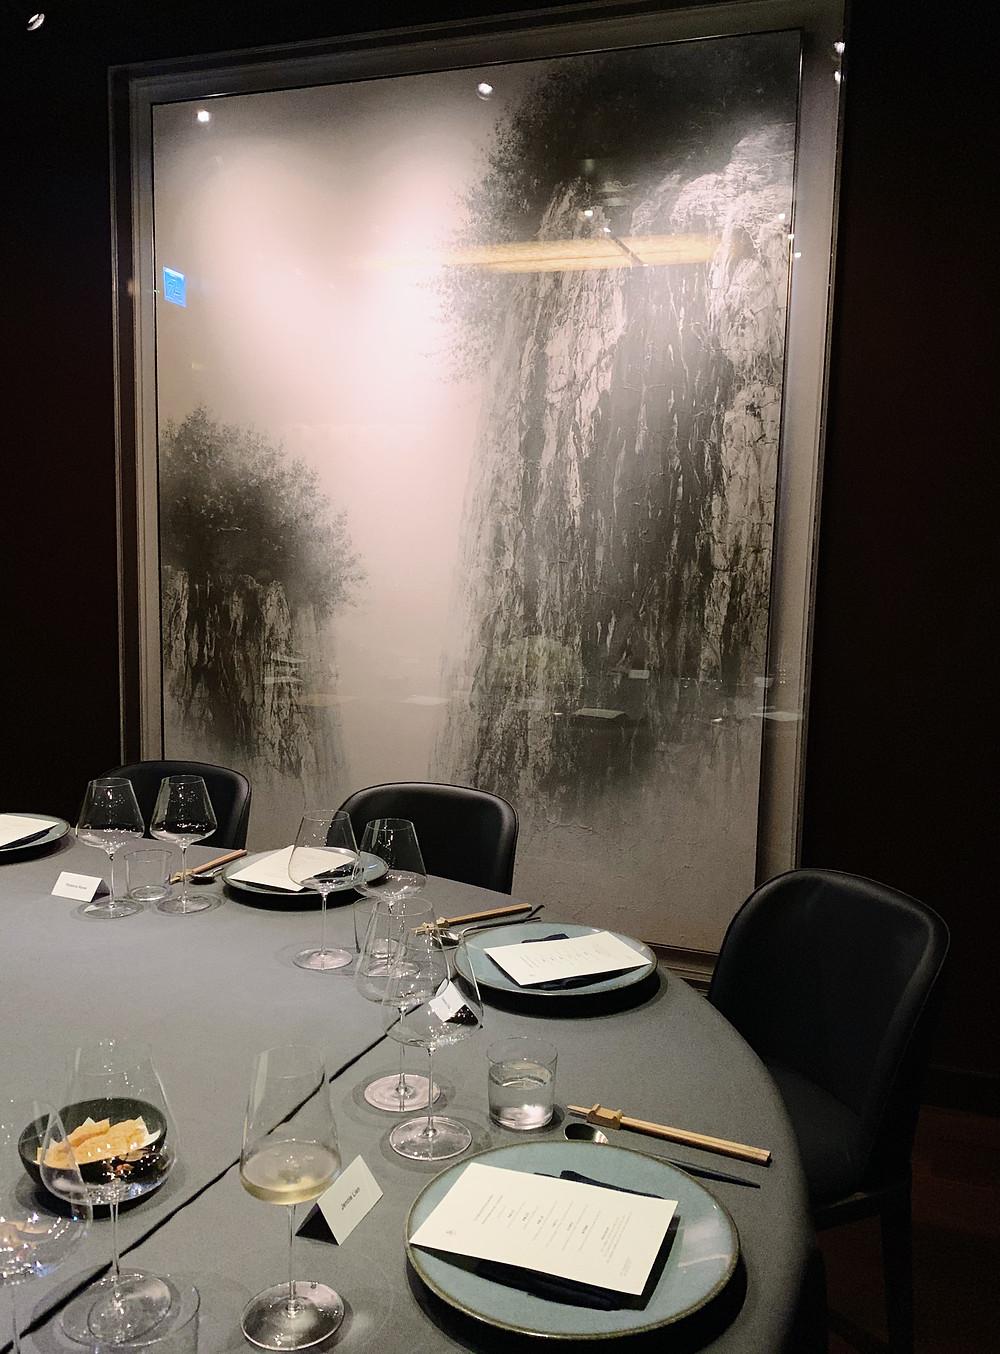 Interiors at PIIN Wine Restaurant in Hong Kong